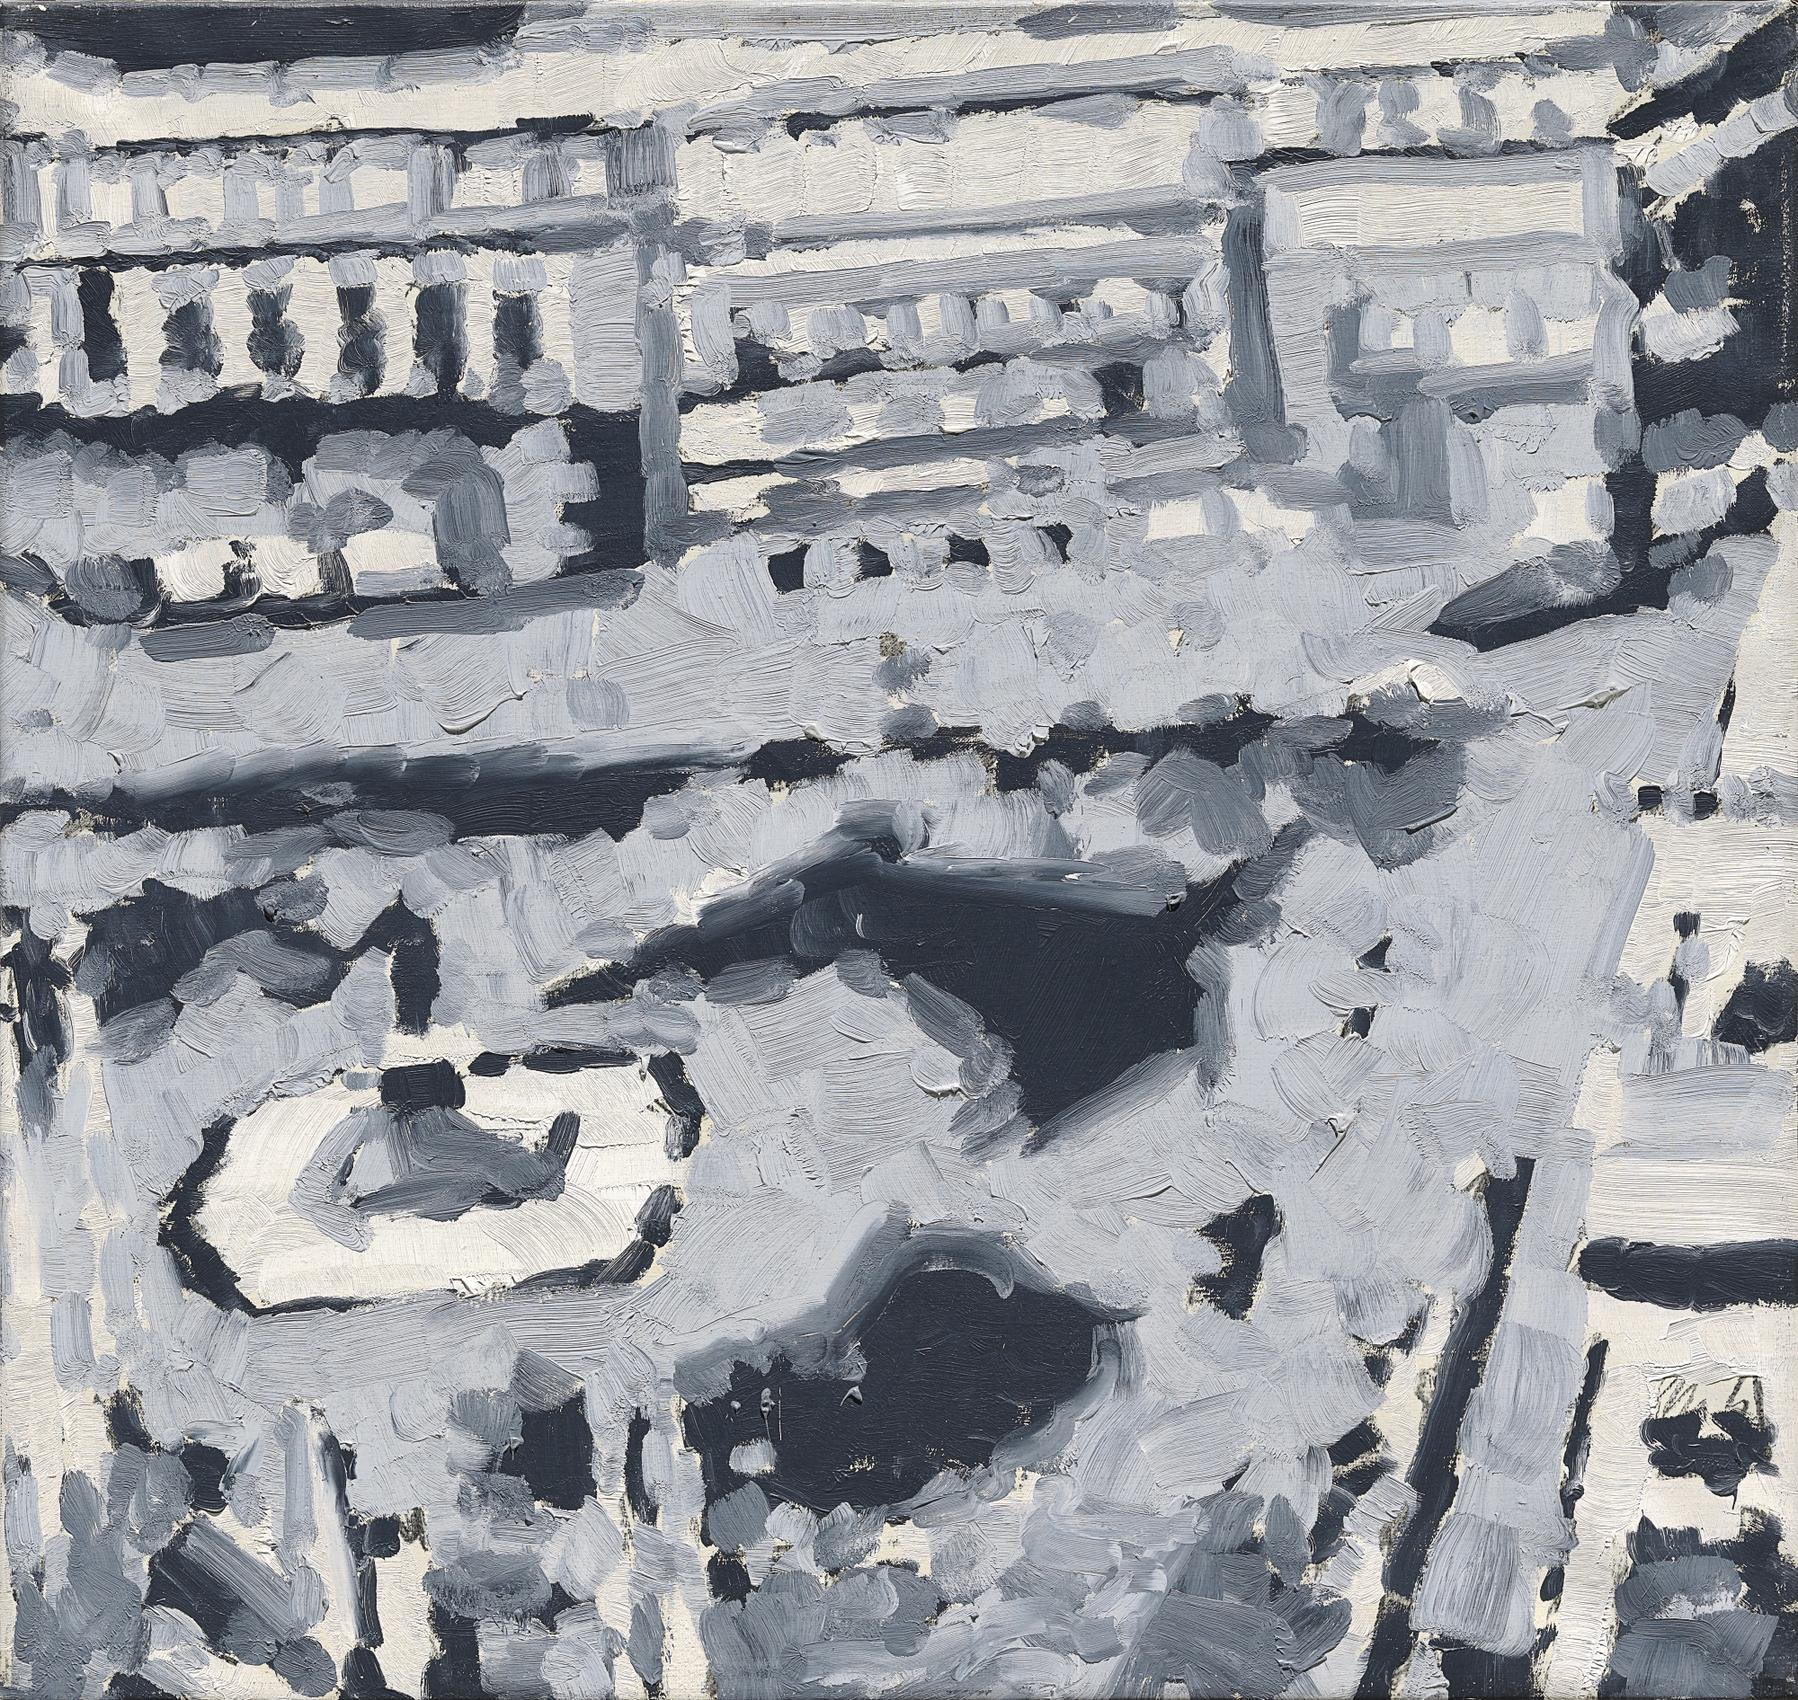 Gerhard Richter-Stadtbild M6 (Townscape M6)-1968